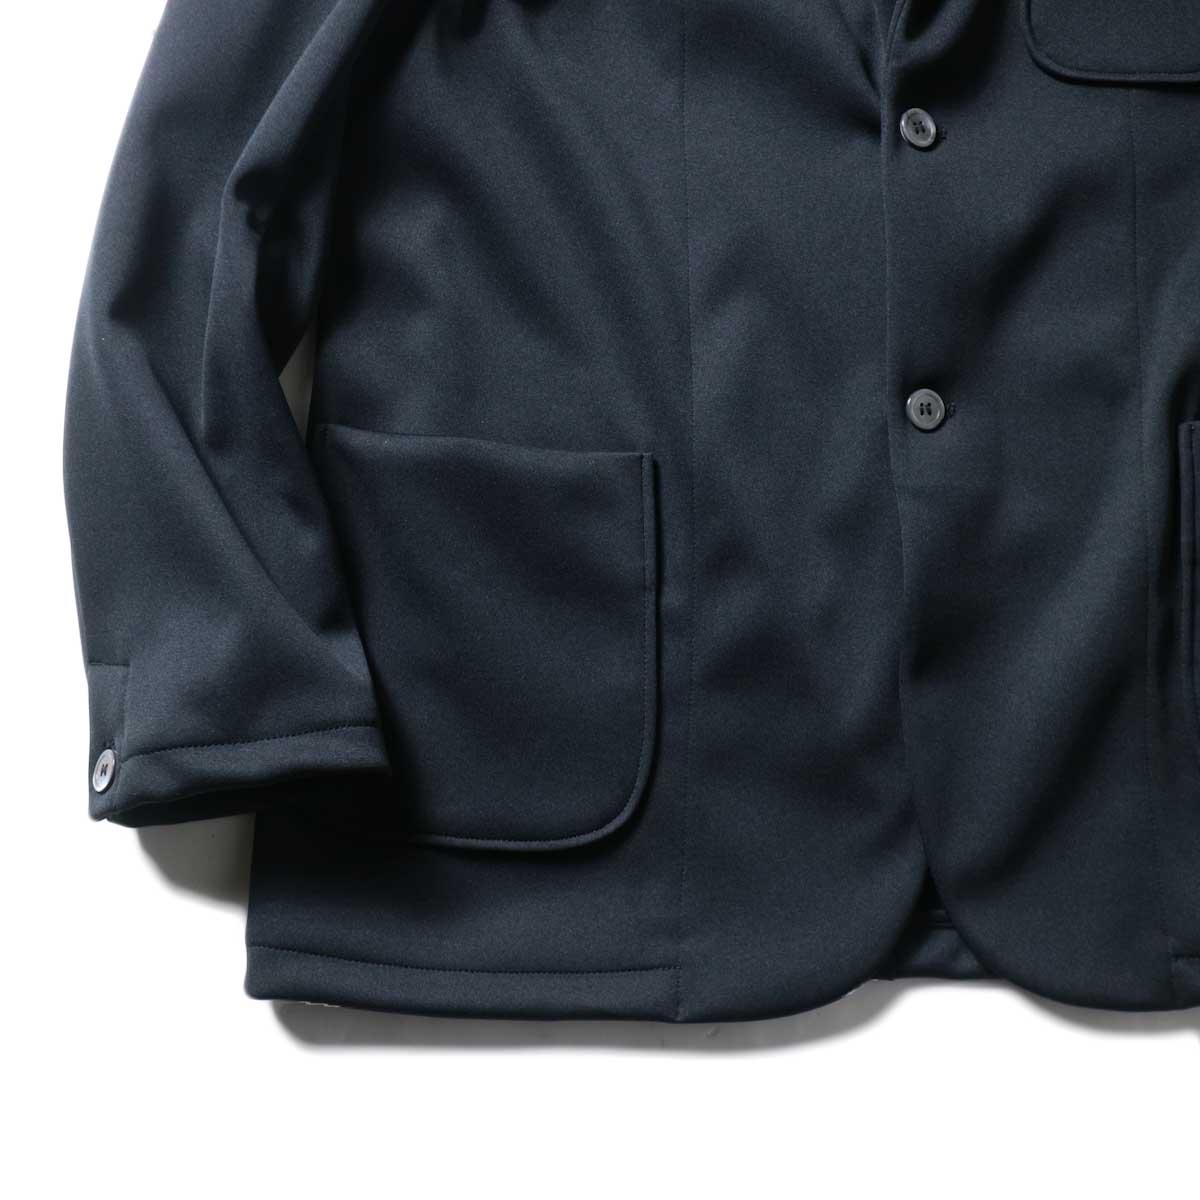 CURLY / TRACK JACKET (Black)袖、裾